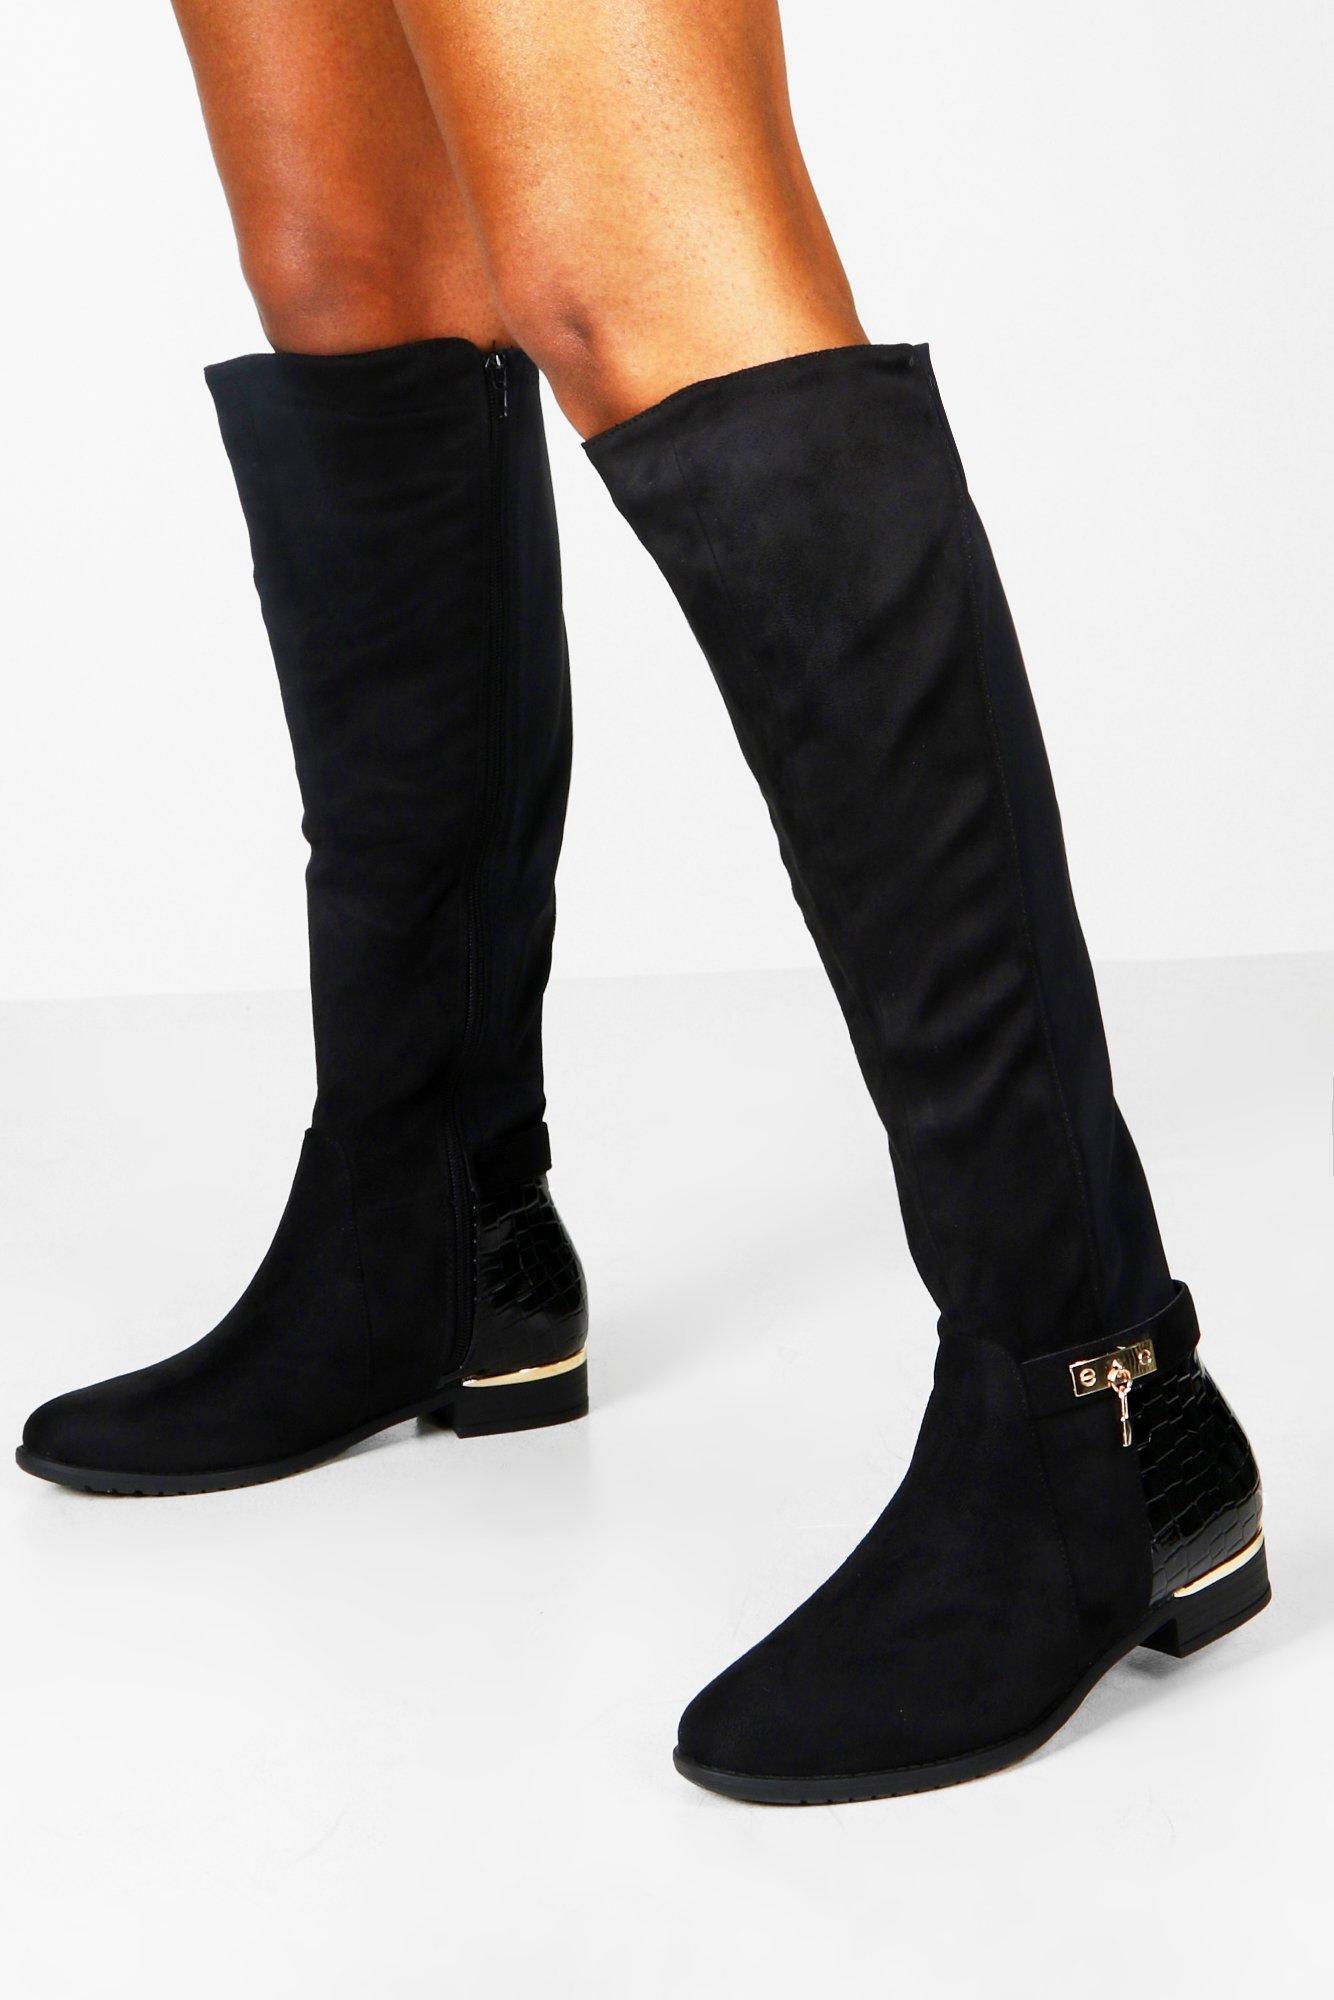 Flat Boots Croc Panel Stretch Back Flat Knee High Boots